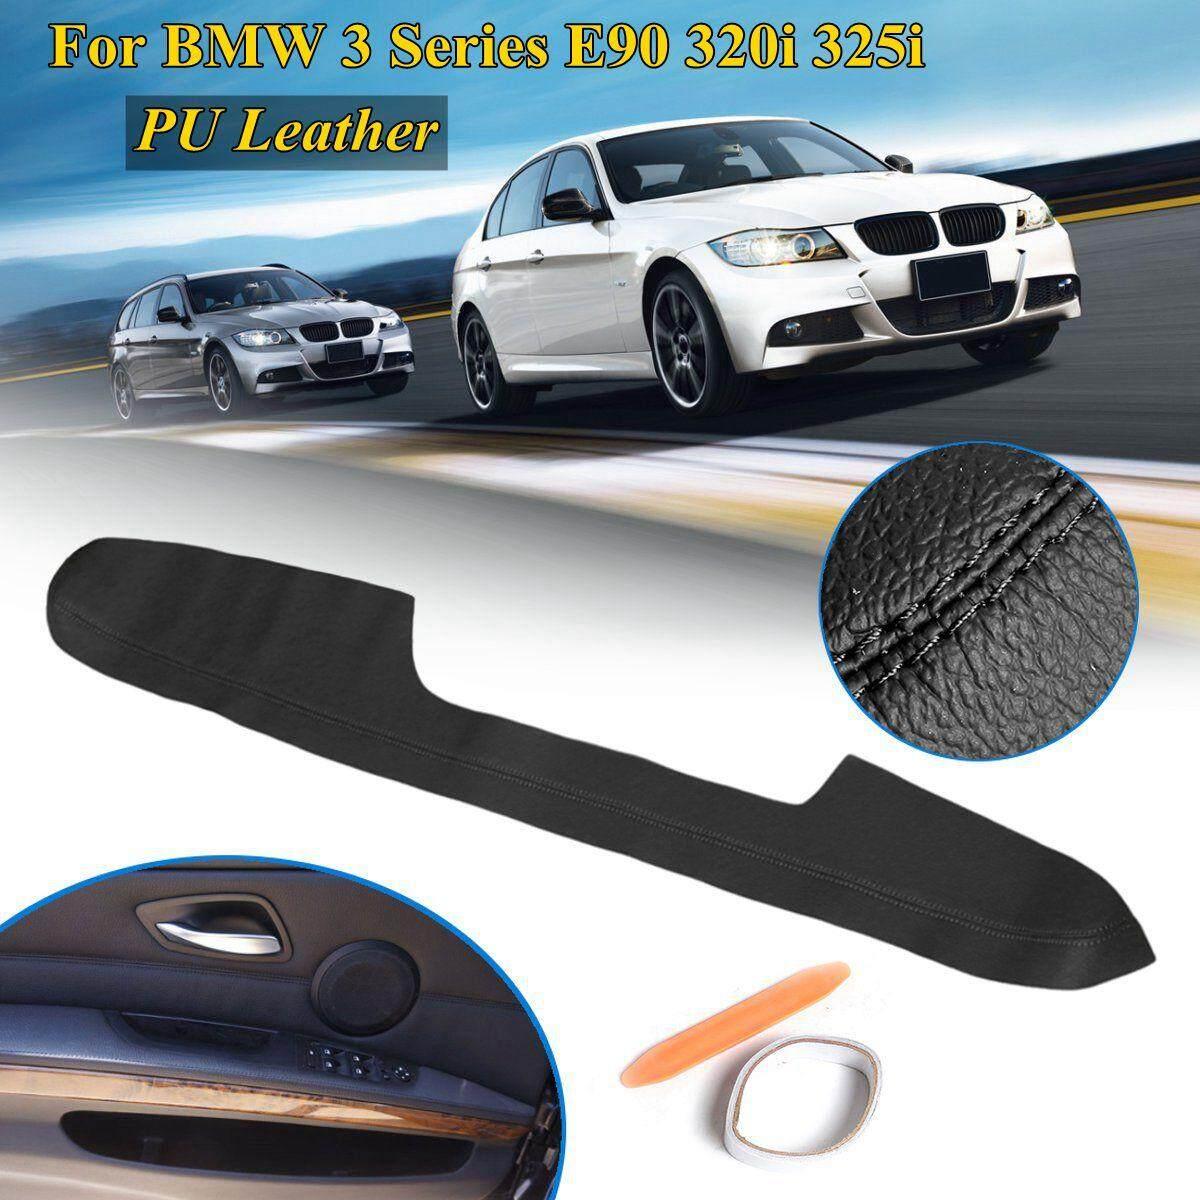 Left Door Armrest Panels Cover Trim Pu Leather For Bmw 3 Series E90 05-11 Black By Audew.